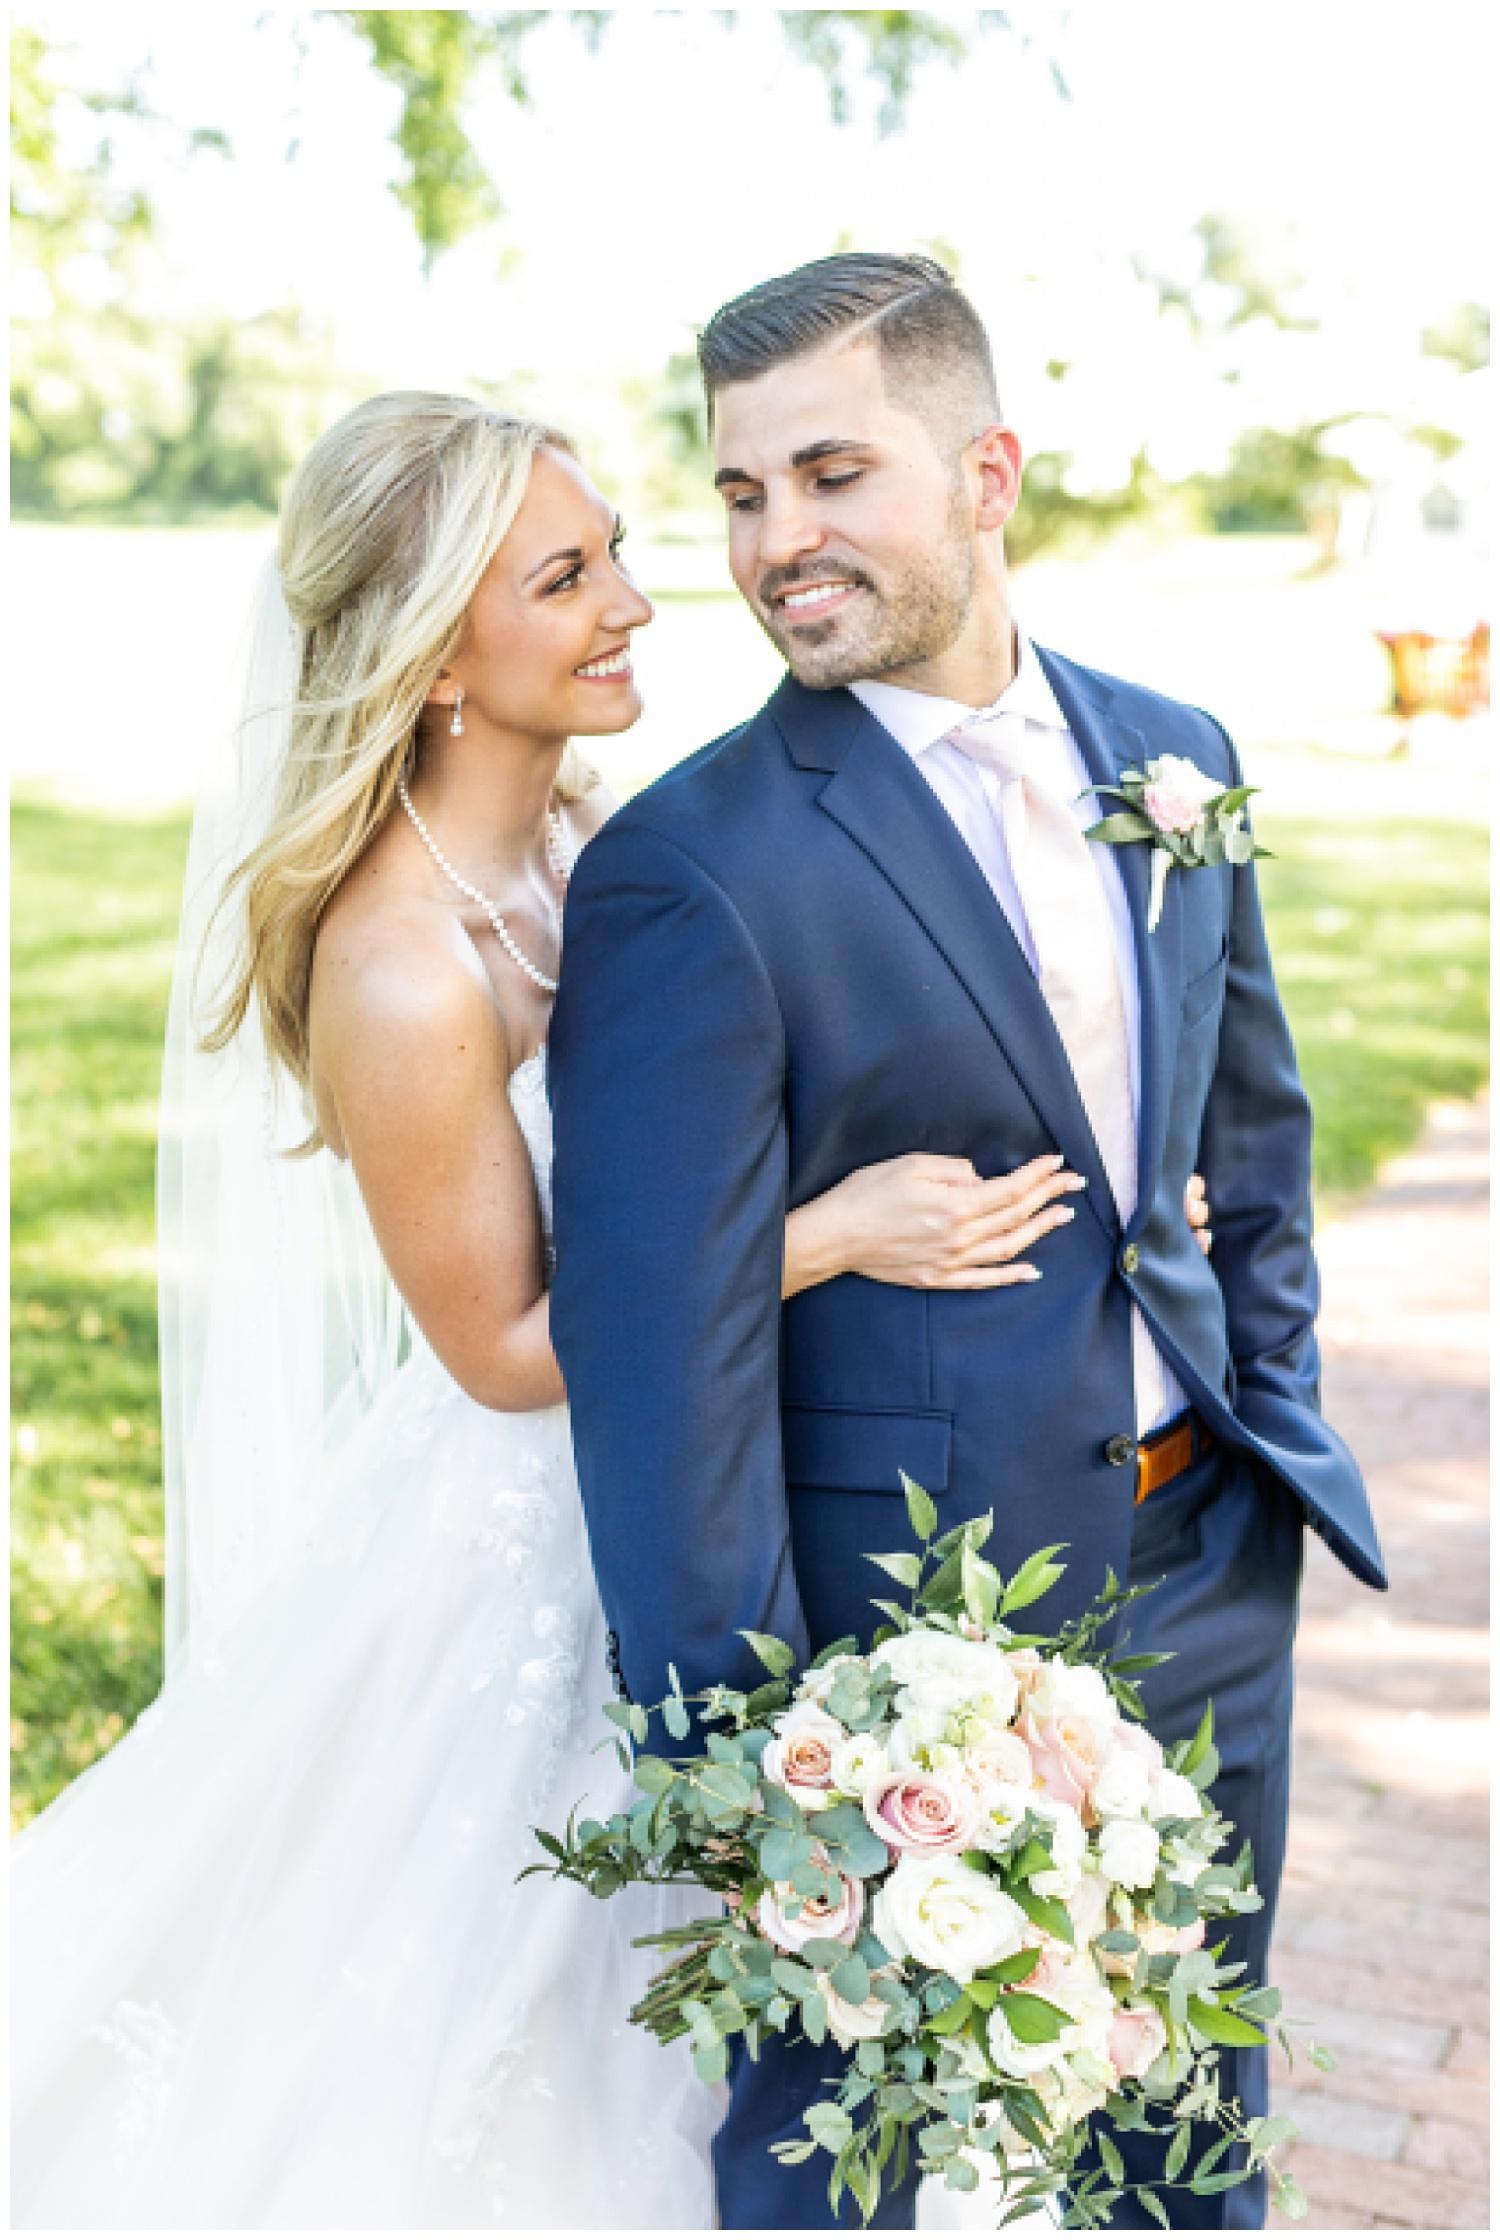 Kelly Mike Swan Harbor Farm Wedding Living Radiant Photography photos_0096.jpg